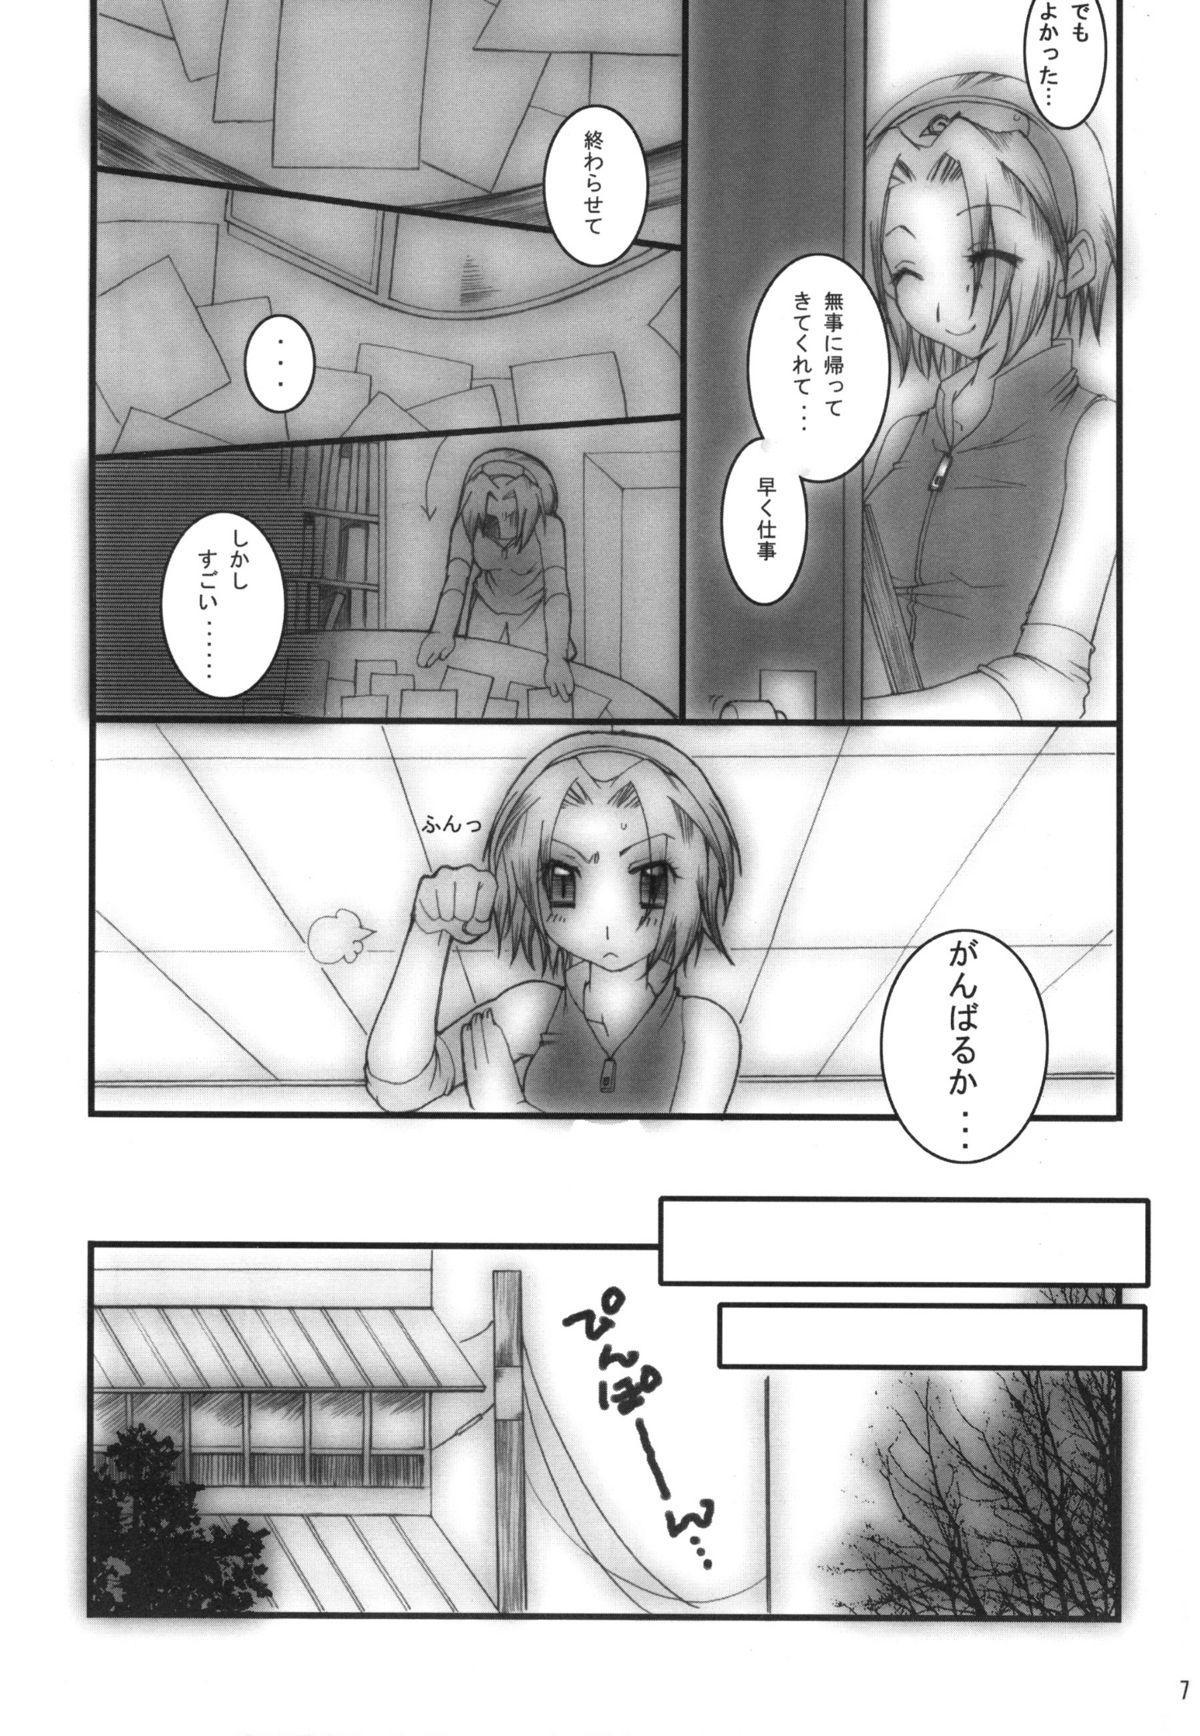 (C70) [HAMUSTAR (Chibinyo)] Hamu-juu -San- (Naruto) 5